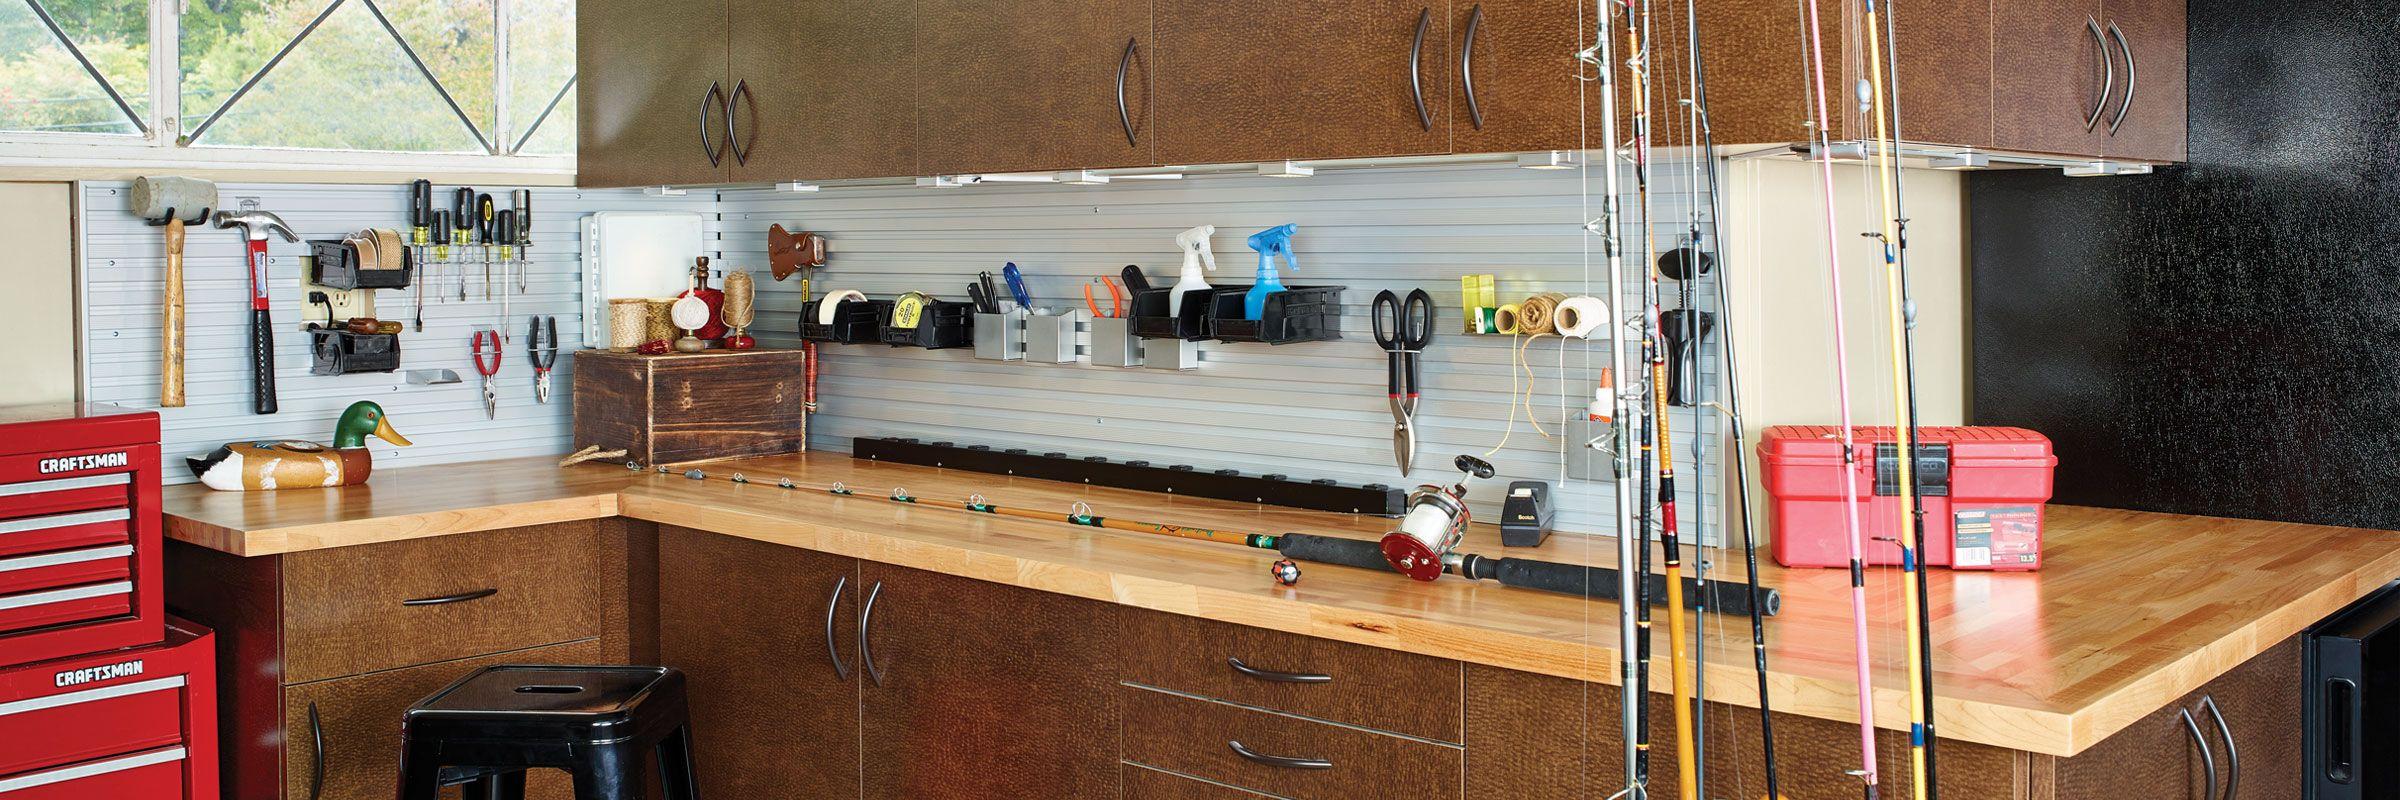 Garage Cabinets Storage Tailored Living. Home Decorators Promo Code. Home  Decor Liquidators. Contemporary